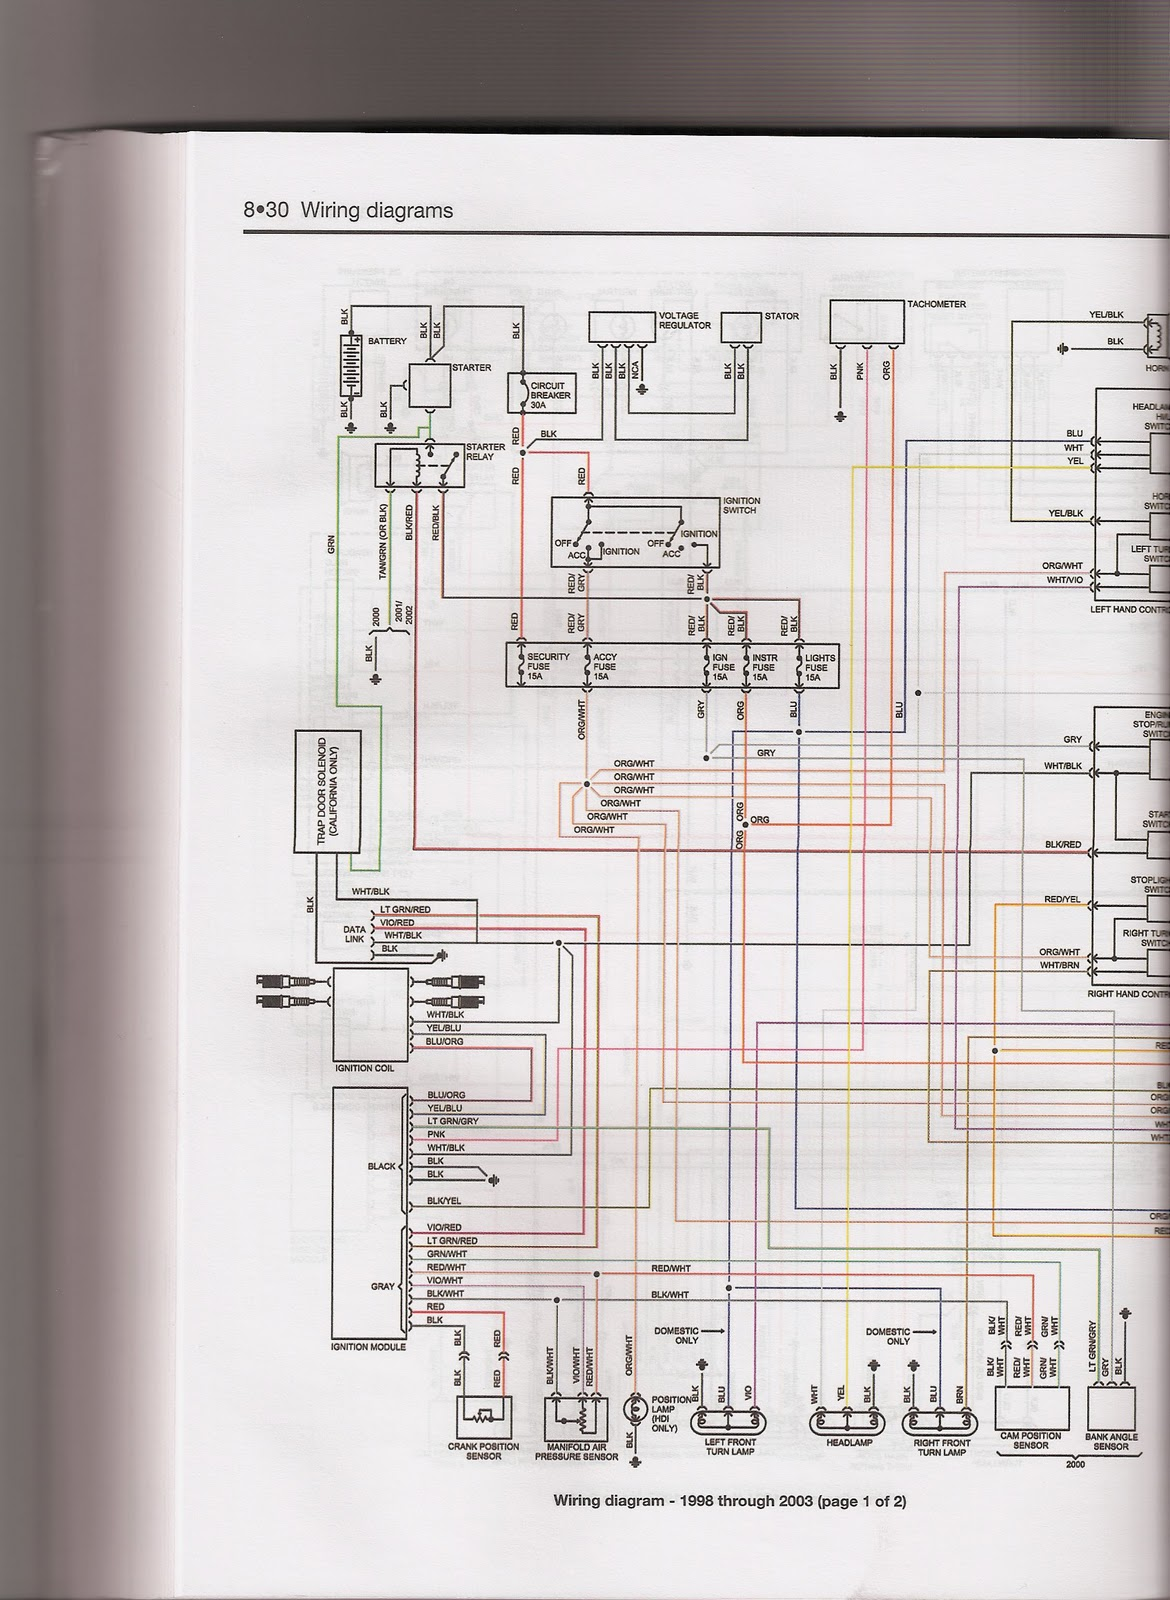 hight resolution of 98 sportster wiring diagram reveolution of wiring diagram u2022 1986 harley sportster 883 wiring diagram